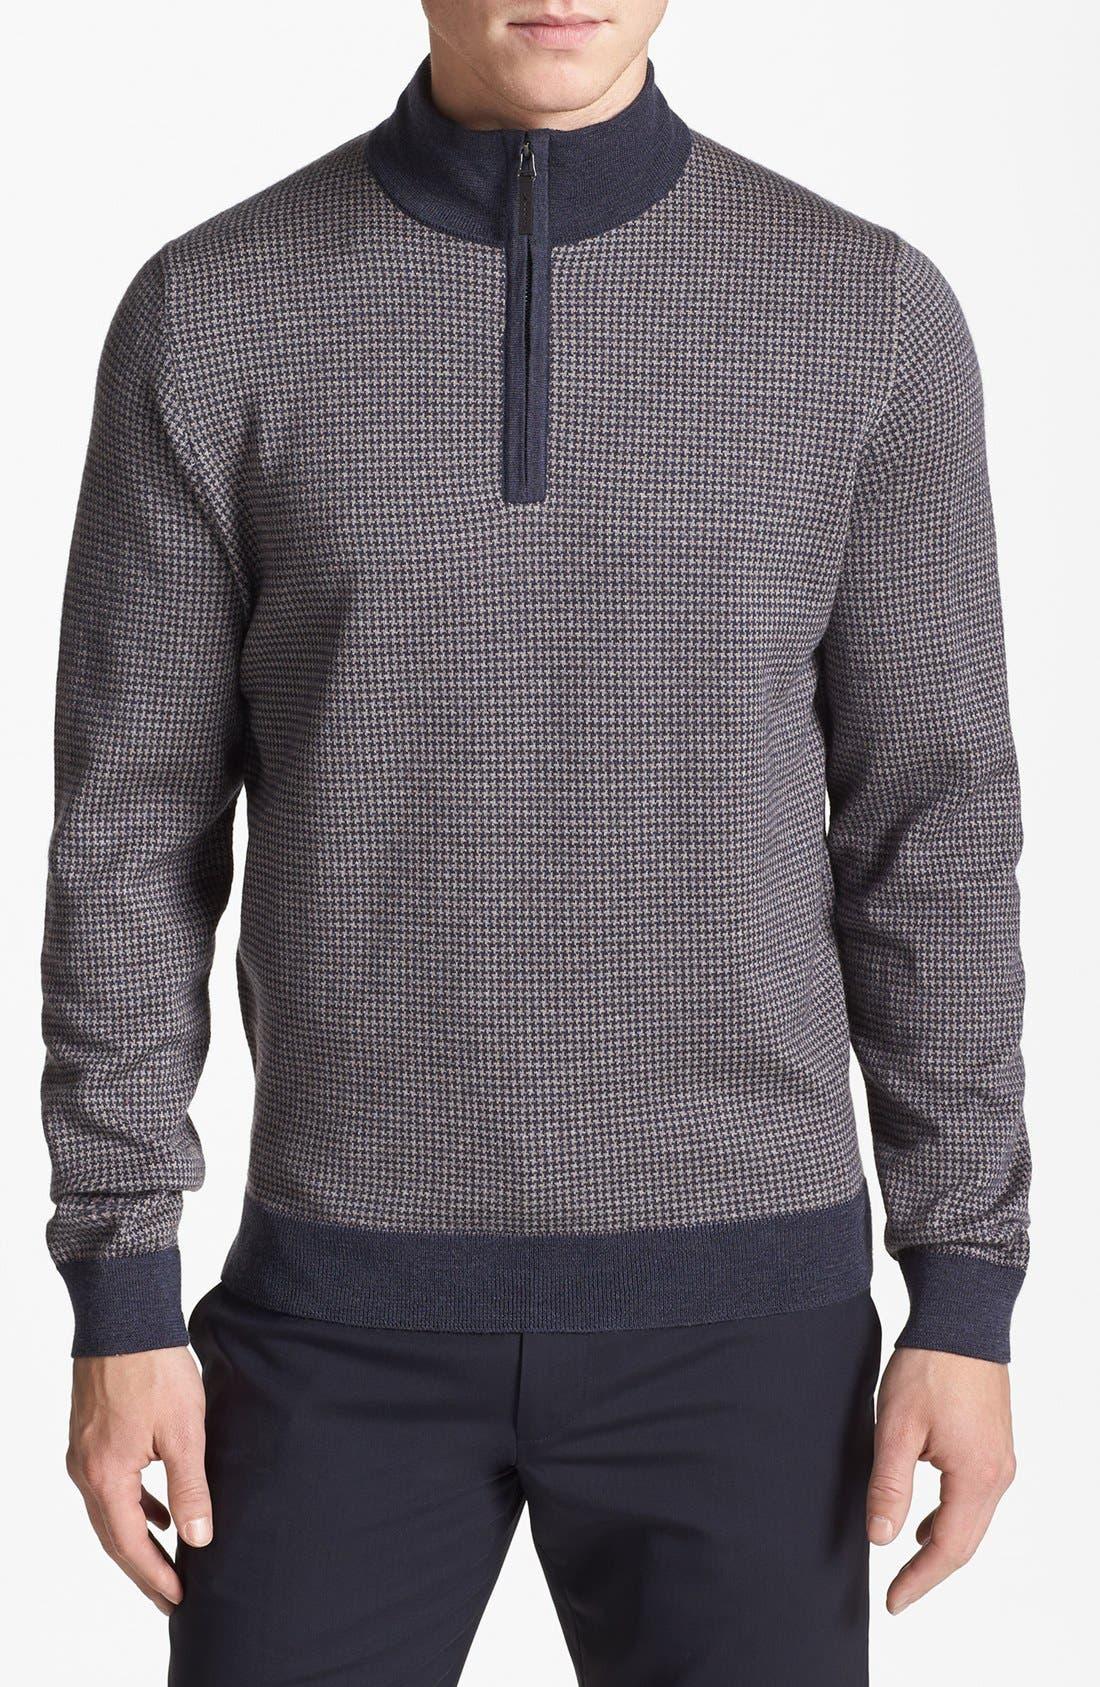 Alternate Image 1 Selected - John W. Nordstrom® Merino Wool Quarter Zip Pullover